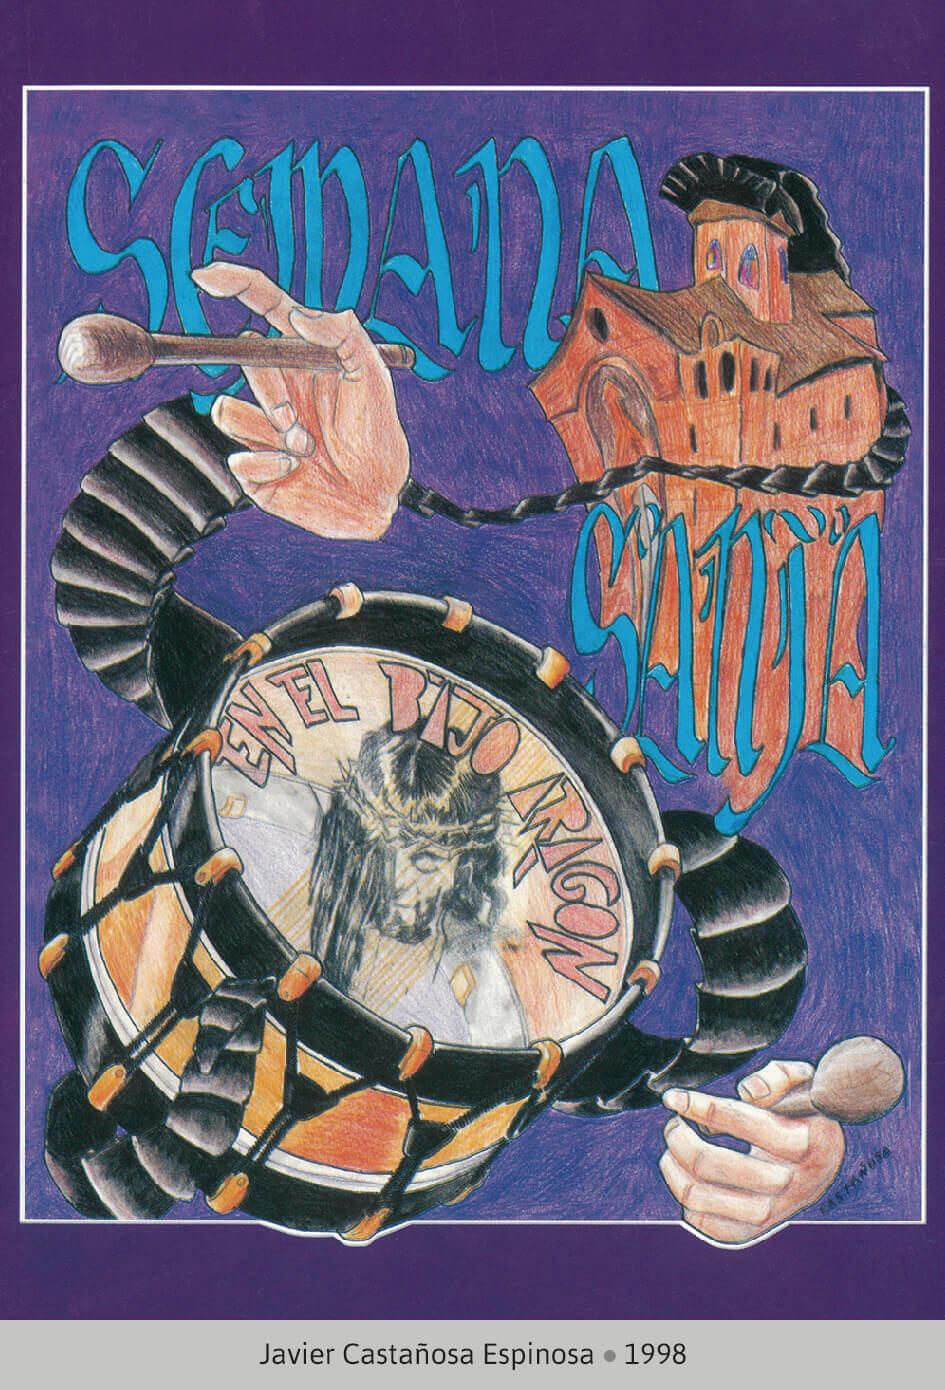 Cartel Ganador Ruta del Tambor y Bombo. Semana Santa 1998